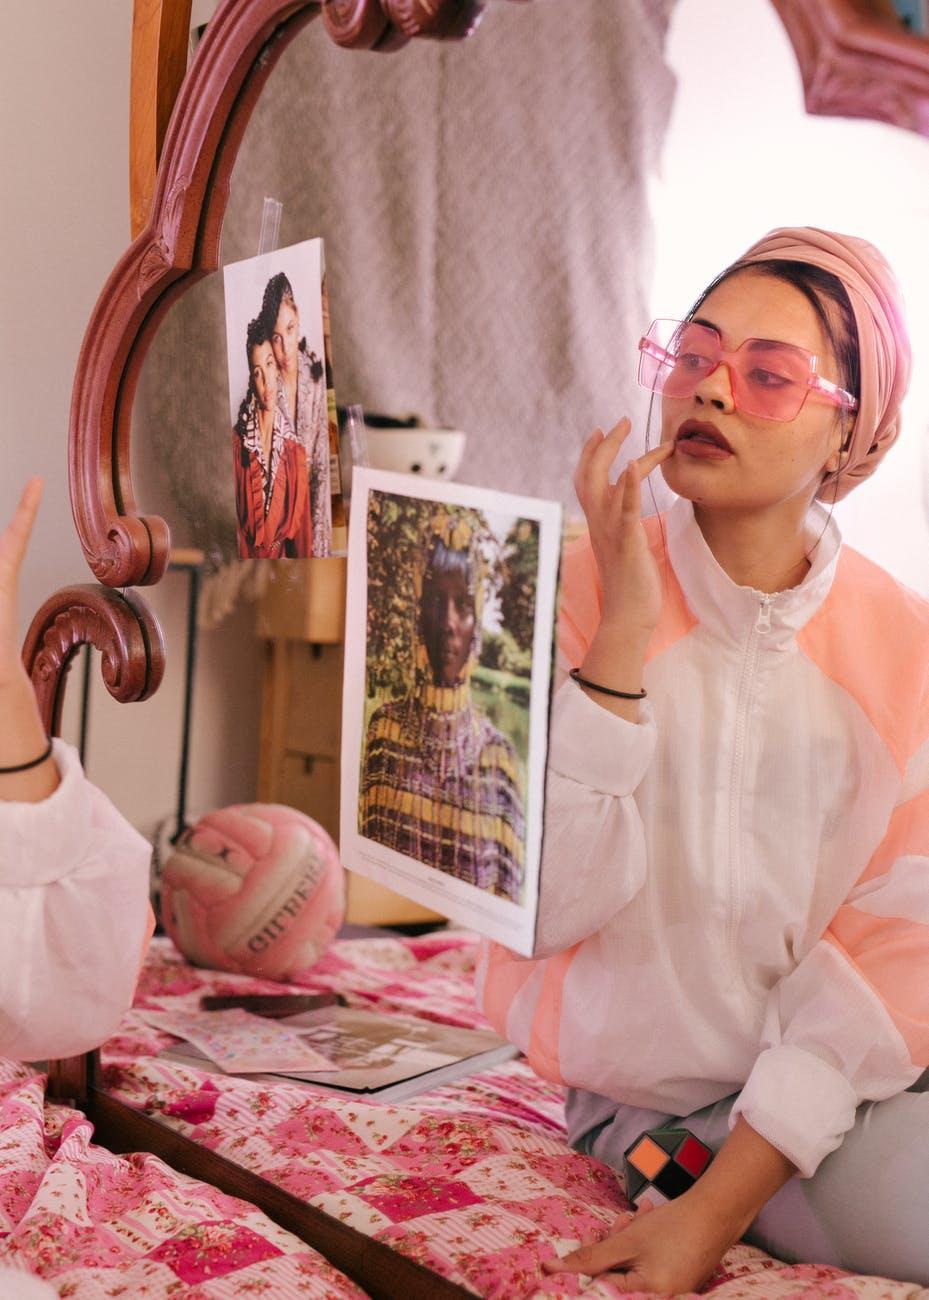 trendy ethnic woman applying lip balm in front of mirror